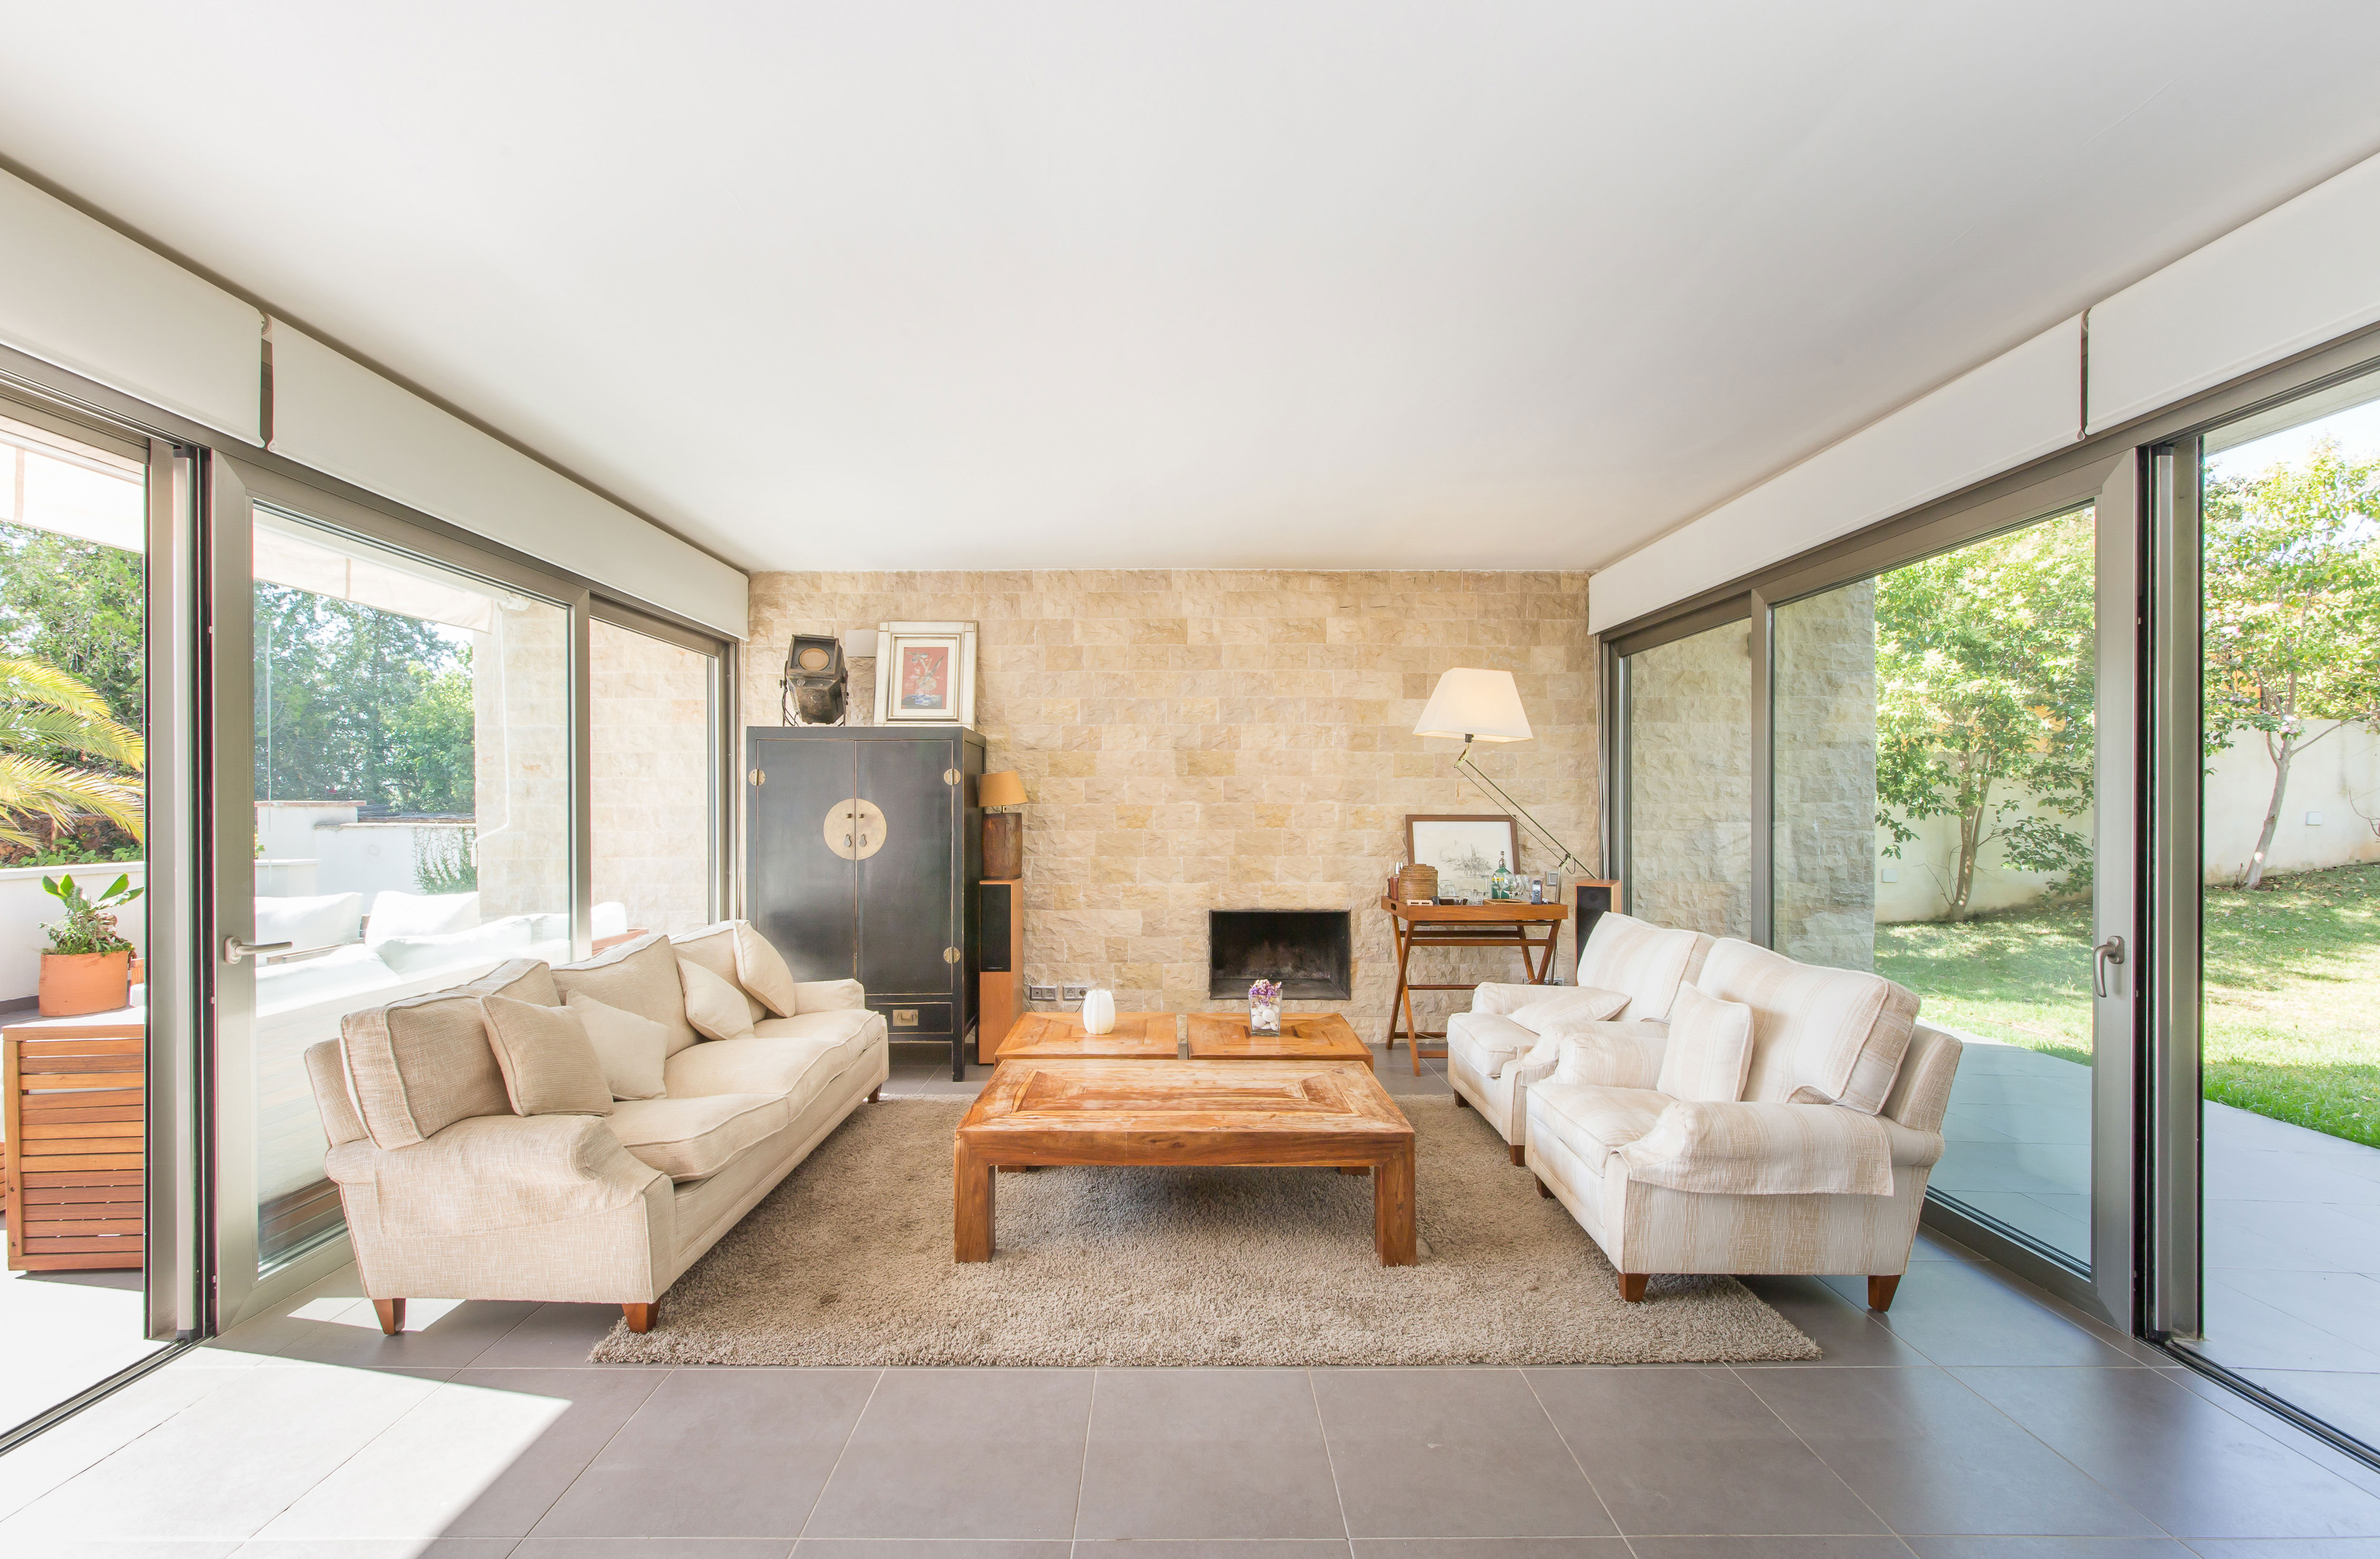 Fotografia Inmobiliaria - Fotografia de Interiores - Valencia - Manuel Garcia - DestacaTuCasa